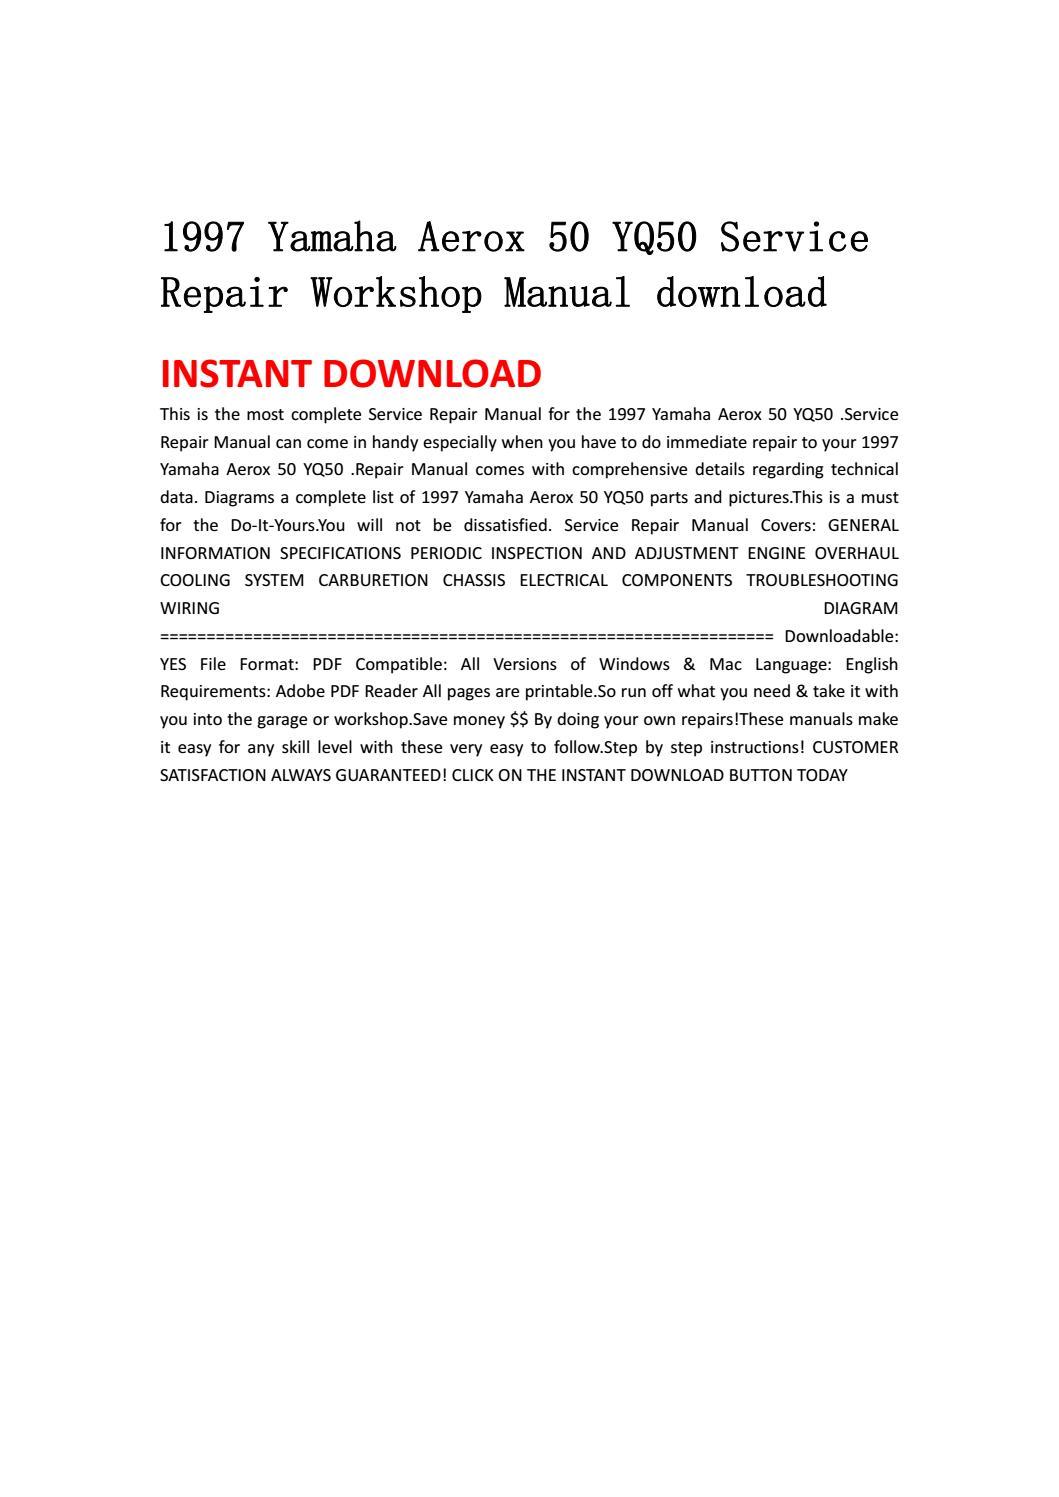 1997 yamaha aerox 50 yq50 service repair workshop manual download by  jhsefnshe - issuu